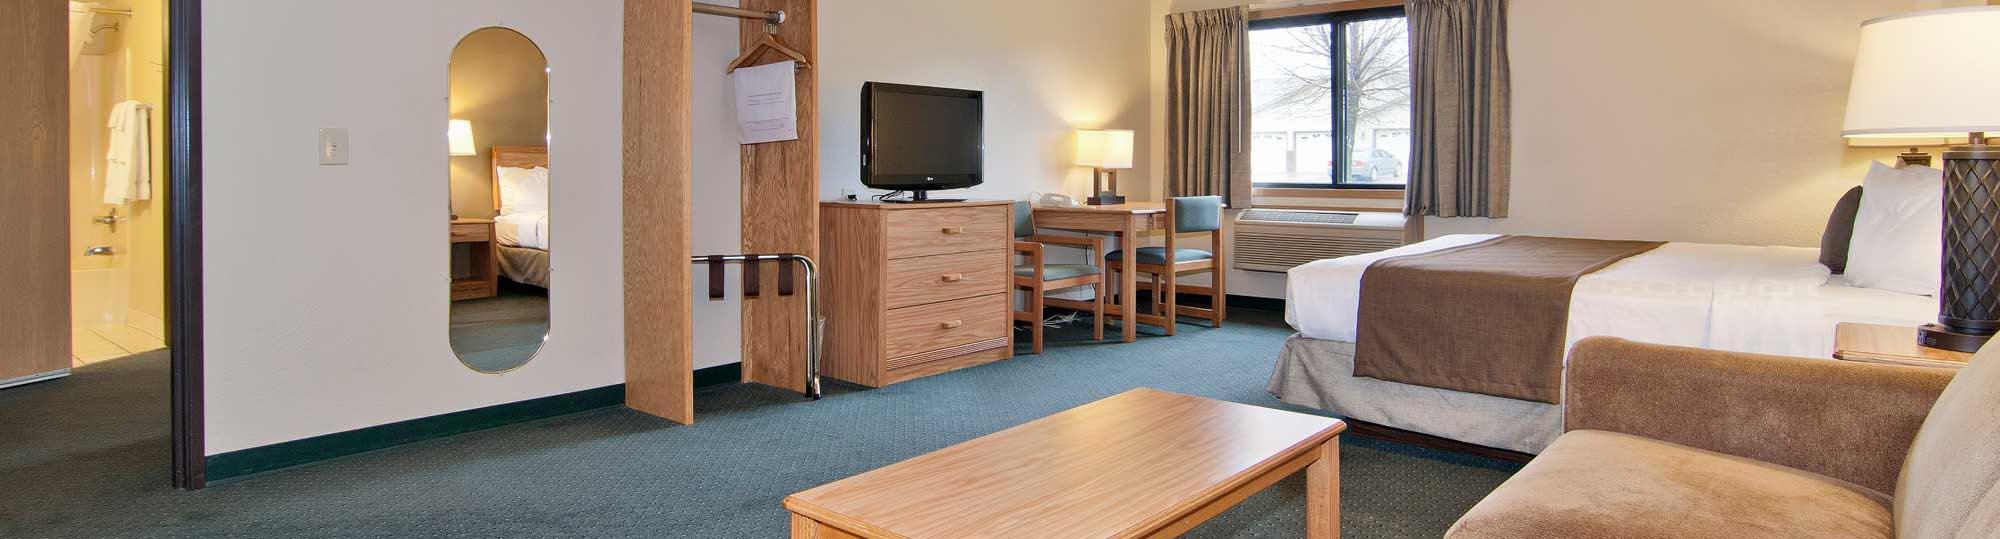 Boarders Inn & Suites Faribault